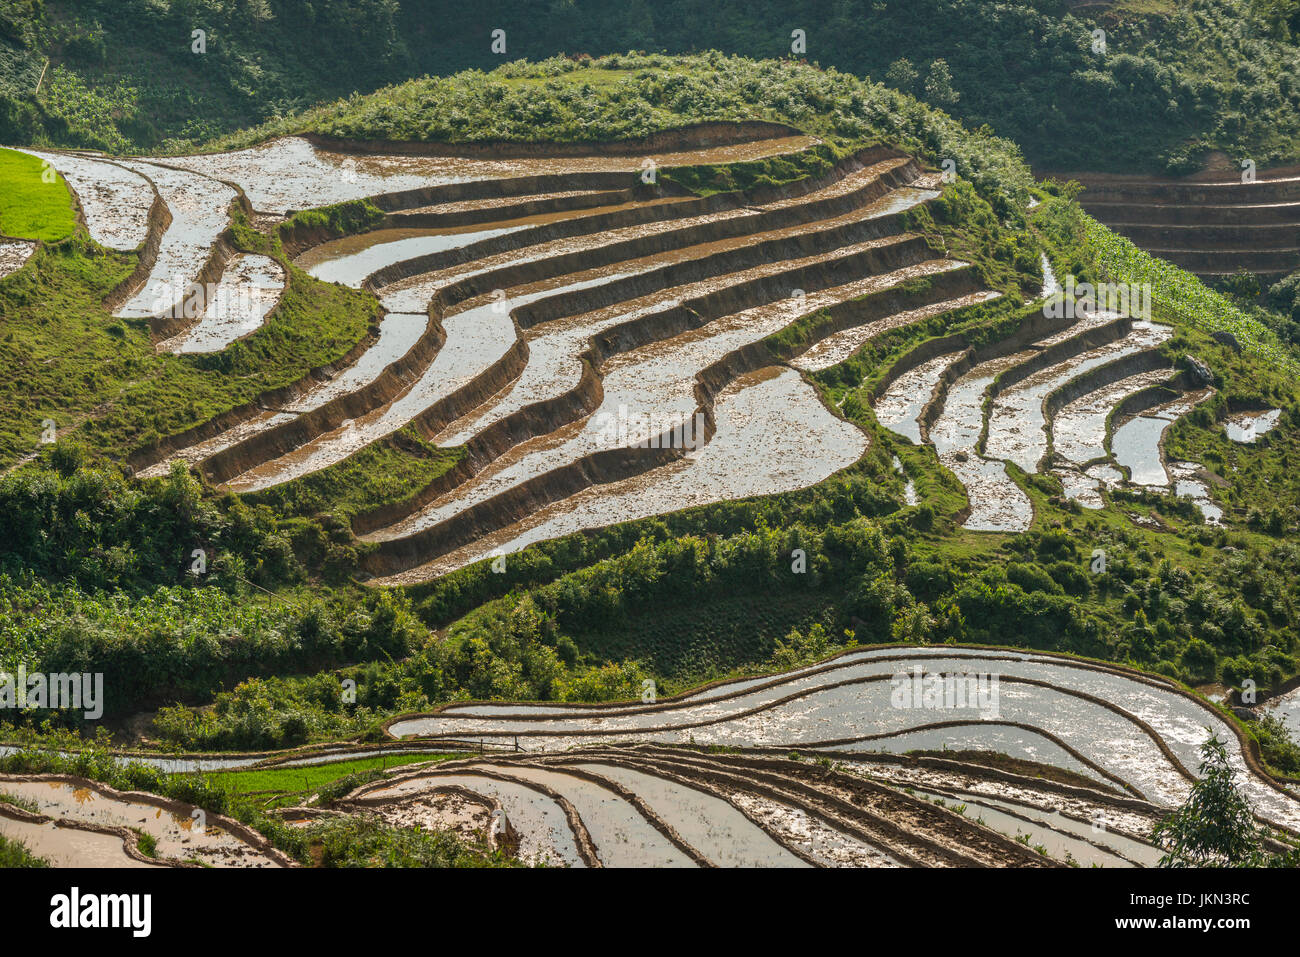 Scenic view of Rice paddies near Sapa, northern Vietnam. - Stock Image